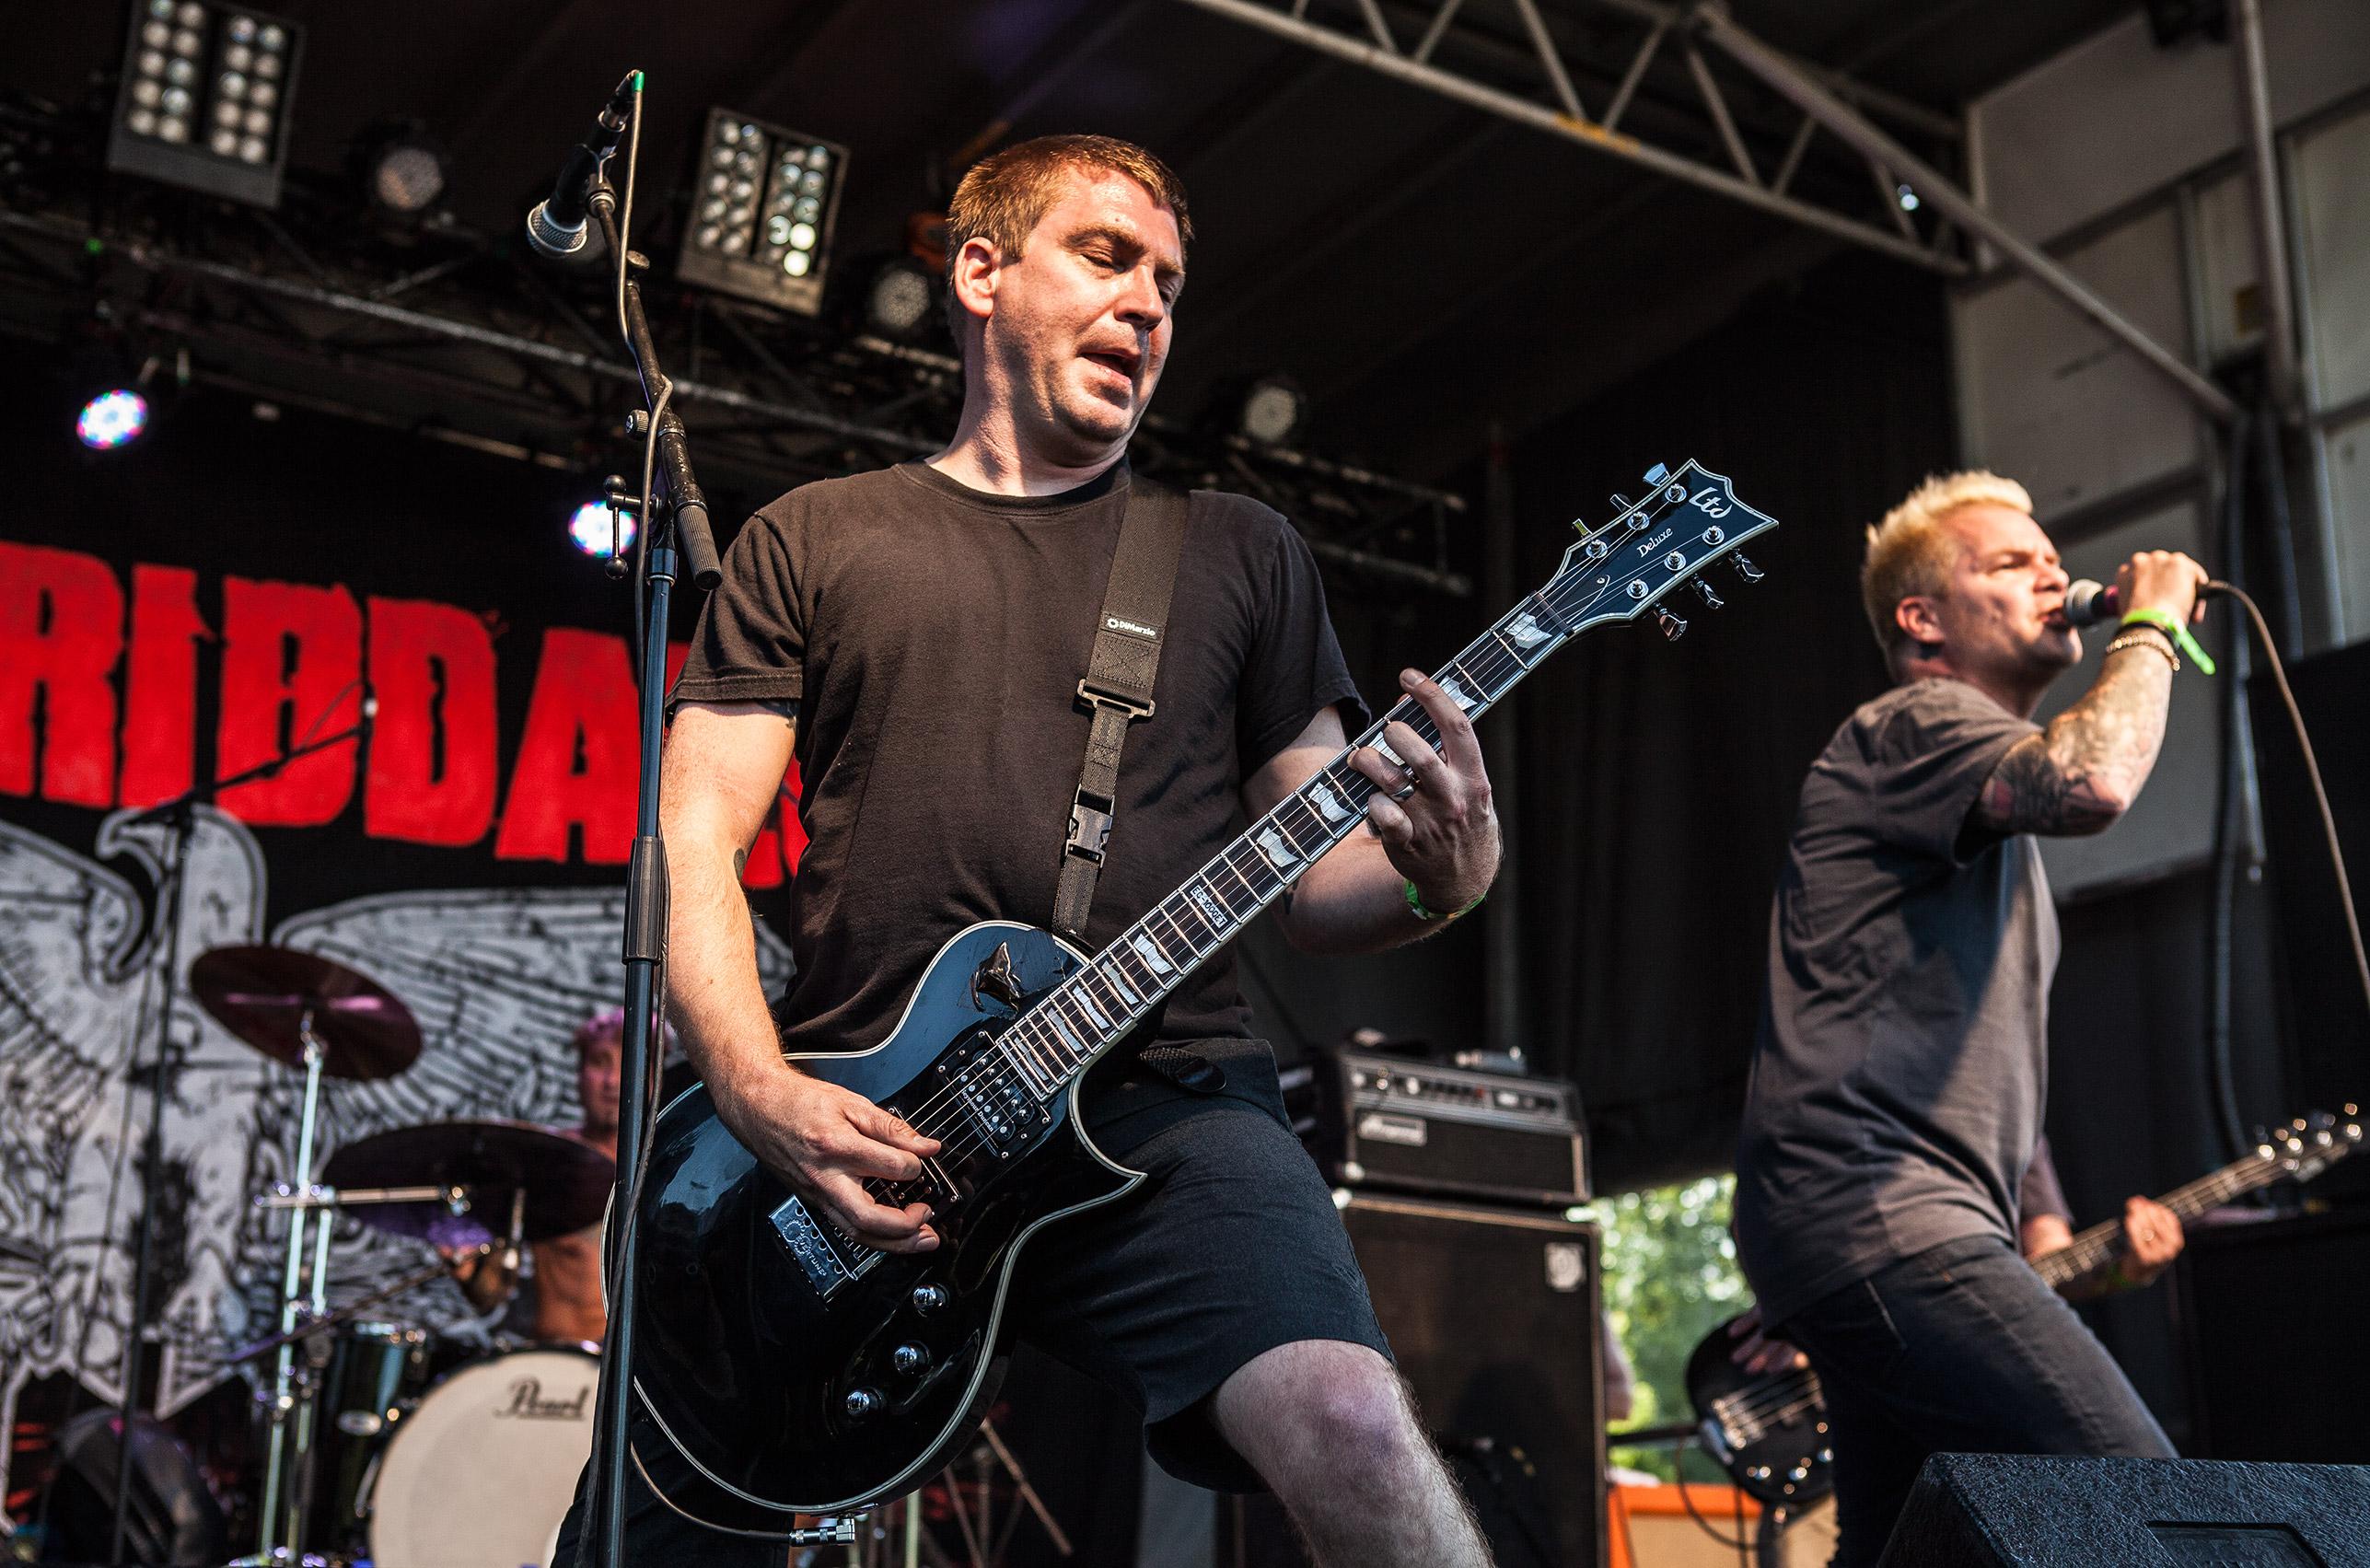 amnesia-rockfest-2015-good-riddance-photo-6